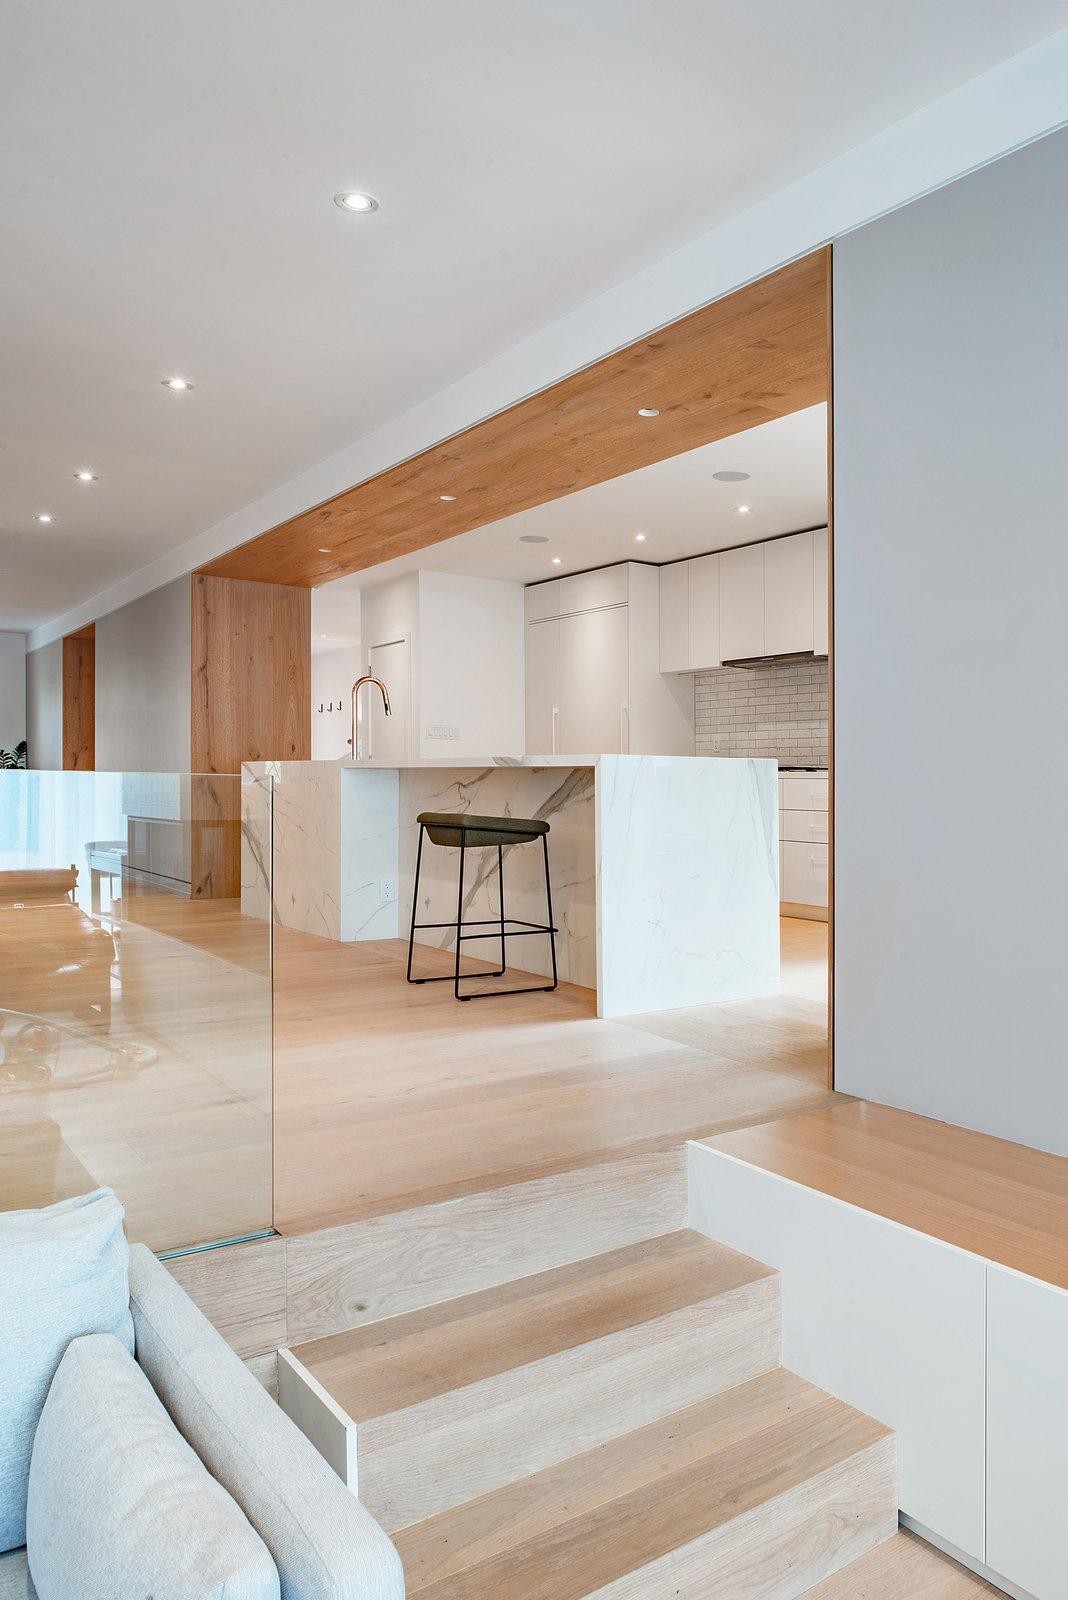 Kitchen, Quartzite Counter, White Cabinet, Light Hardwood Floor, Subway Tile Backsplashe, Refrigerator, Recessed Lighting, and Ceiling Lighting  Richview Residence